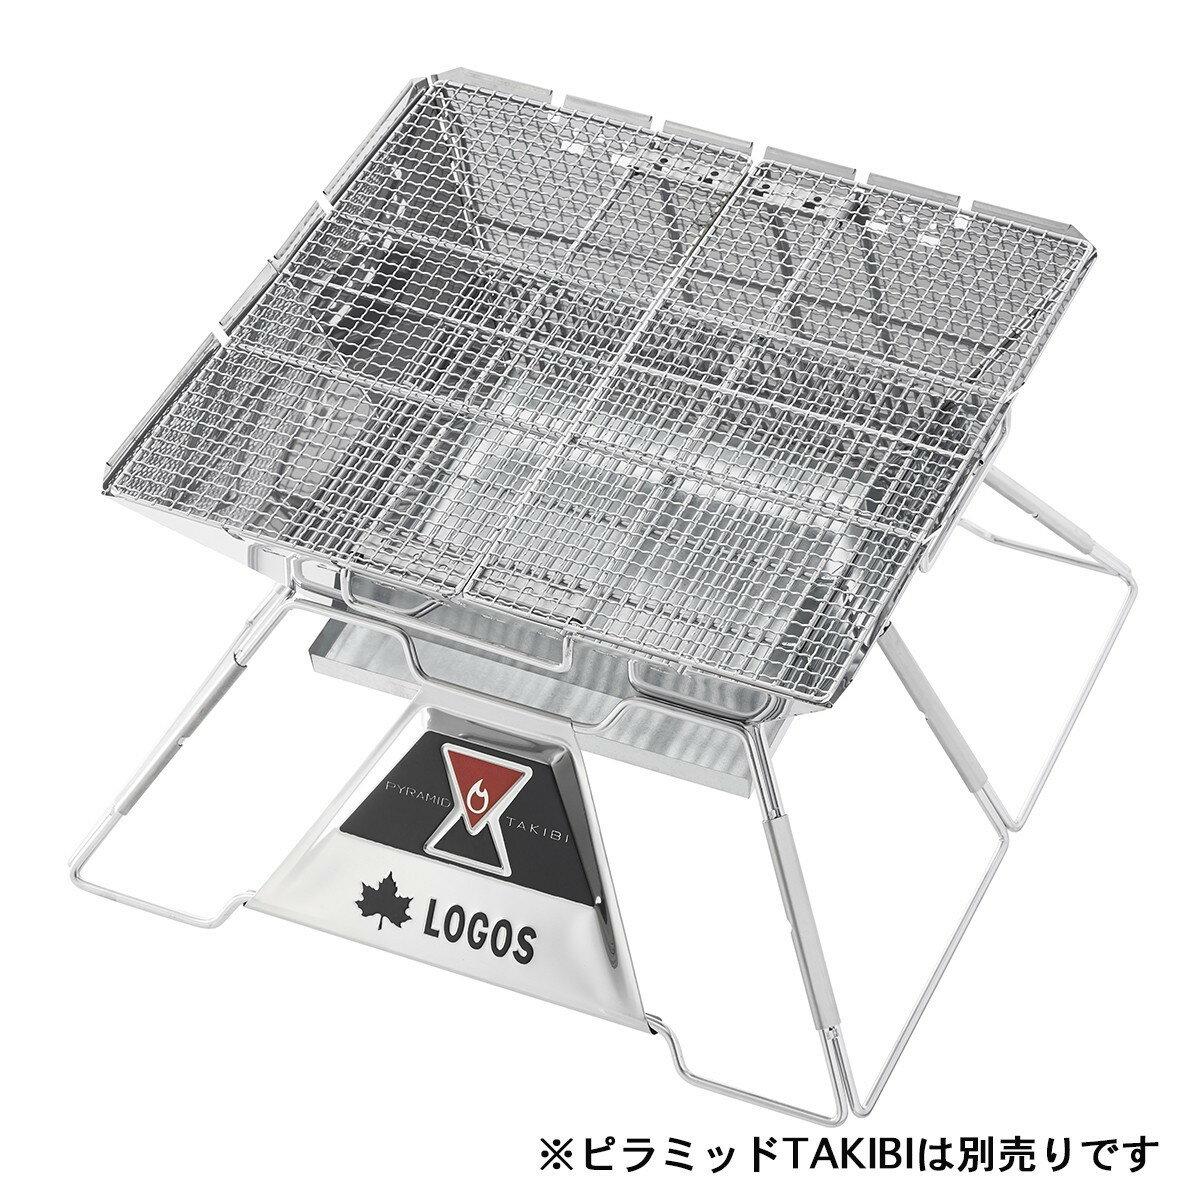 LOGOS/ロゴス ピラミッドSPネットXL 別売りのロゴスピラミッドTAKIBI XL専用焼網